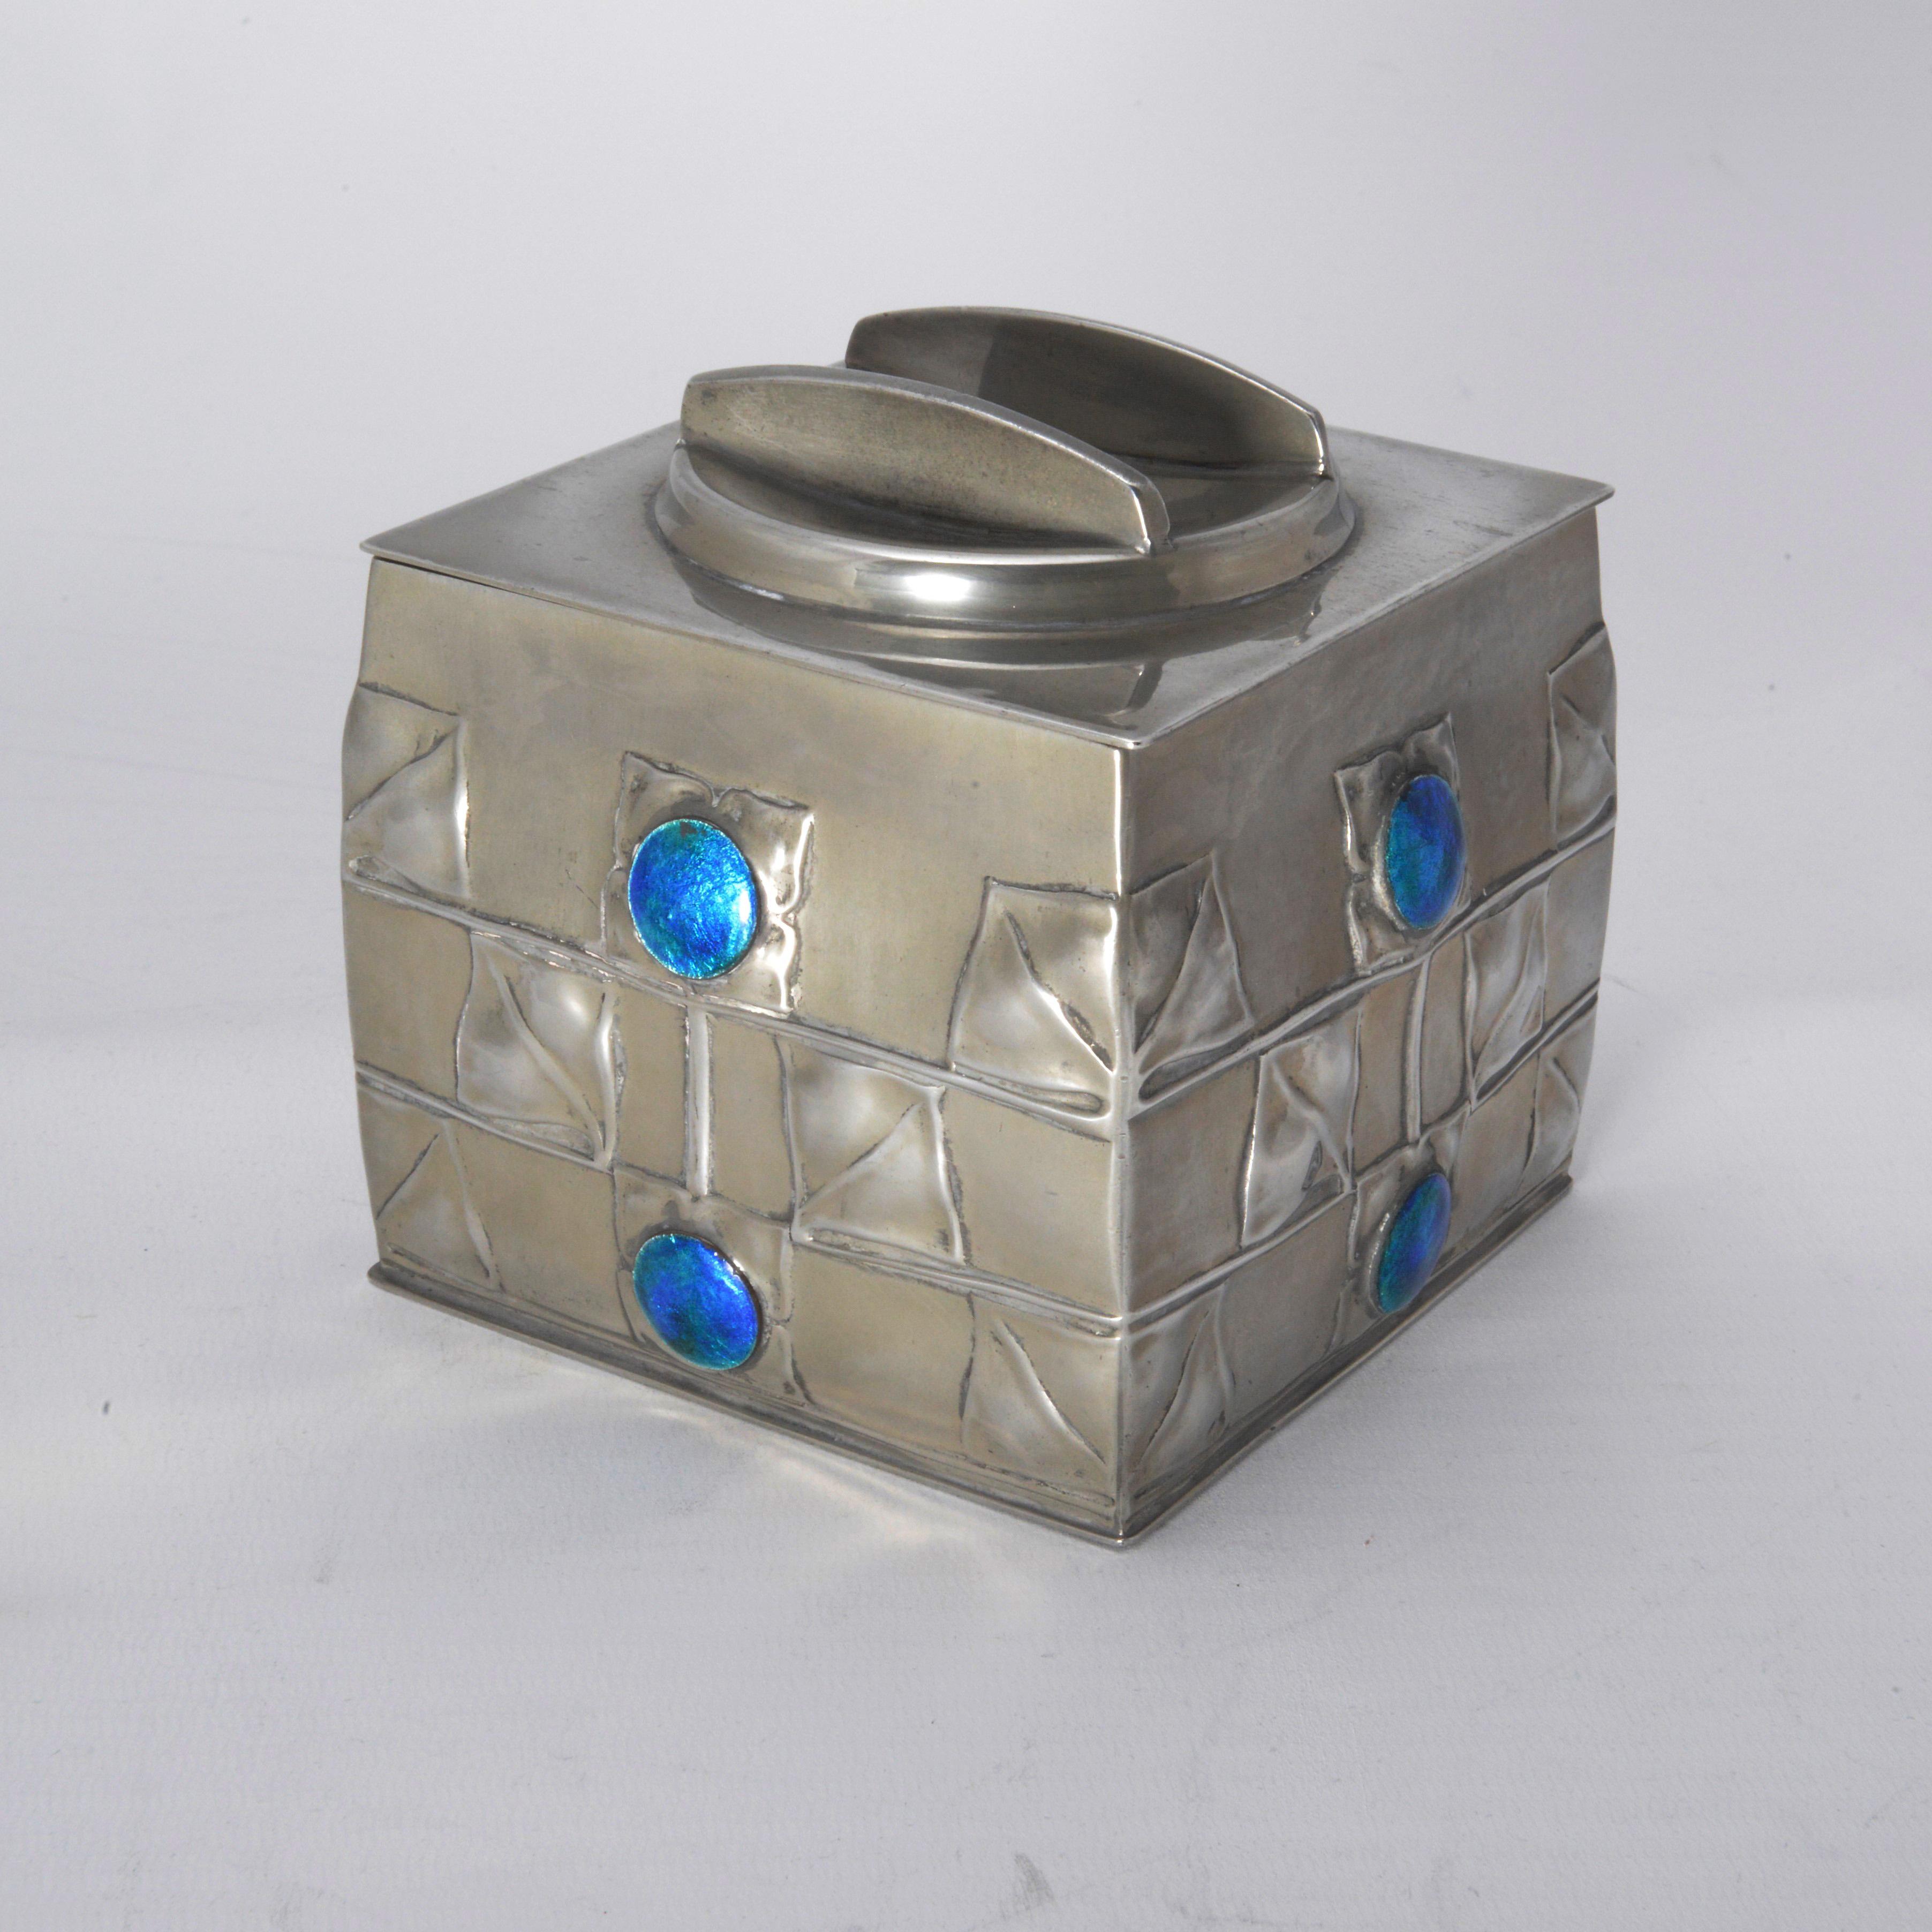 Archibald Knox Tudric biscuit box